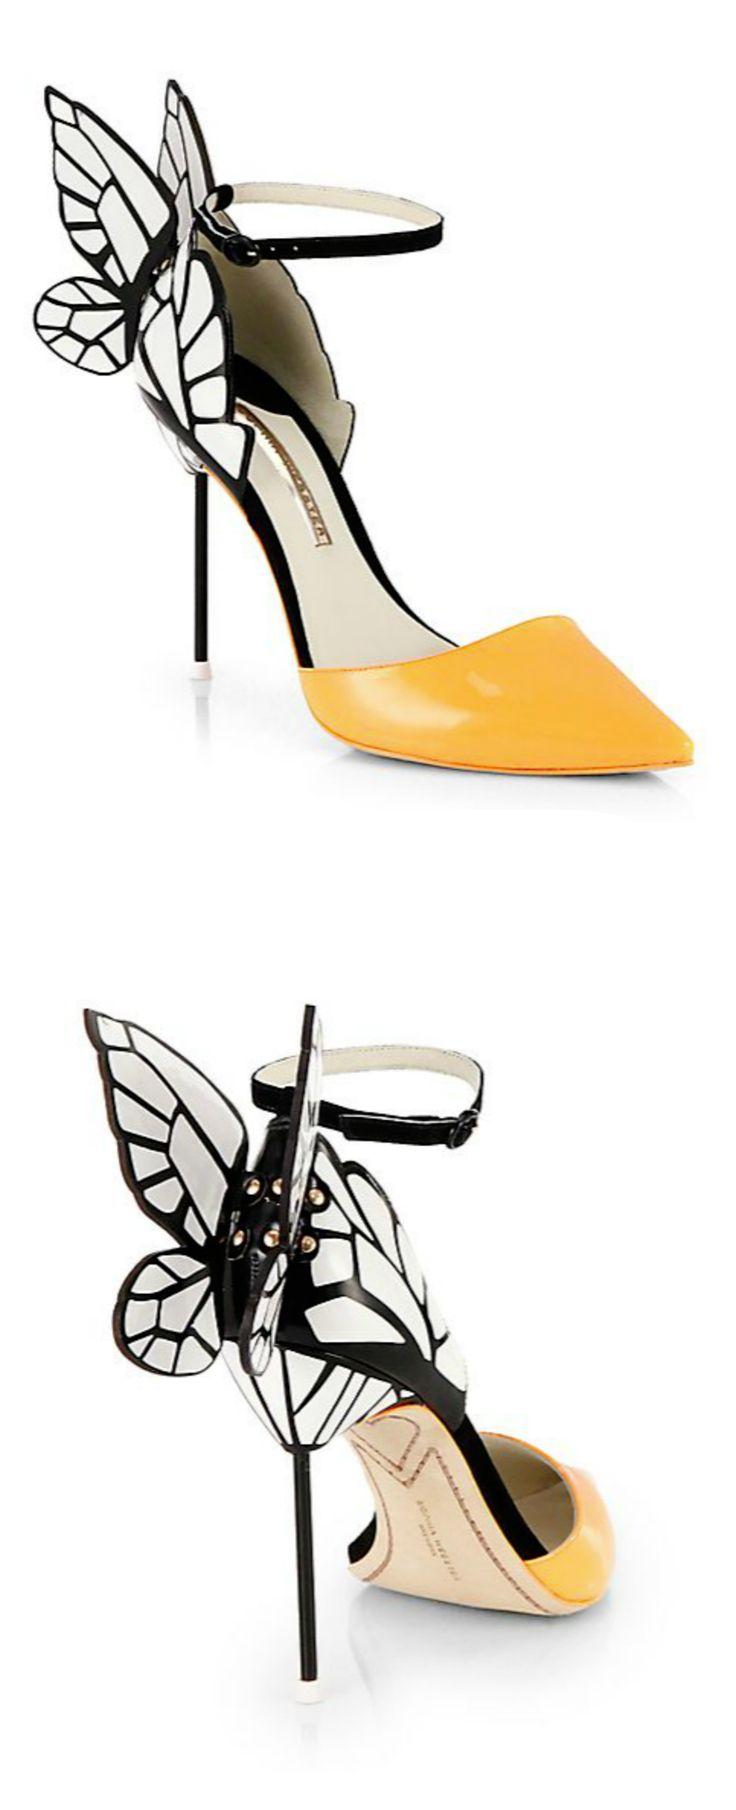 Butterfly Pumps / Sophia Weber- weird shoes